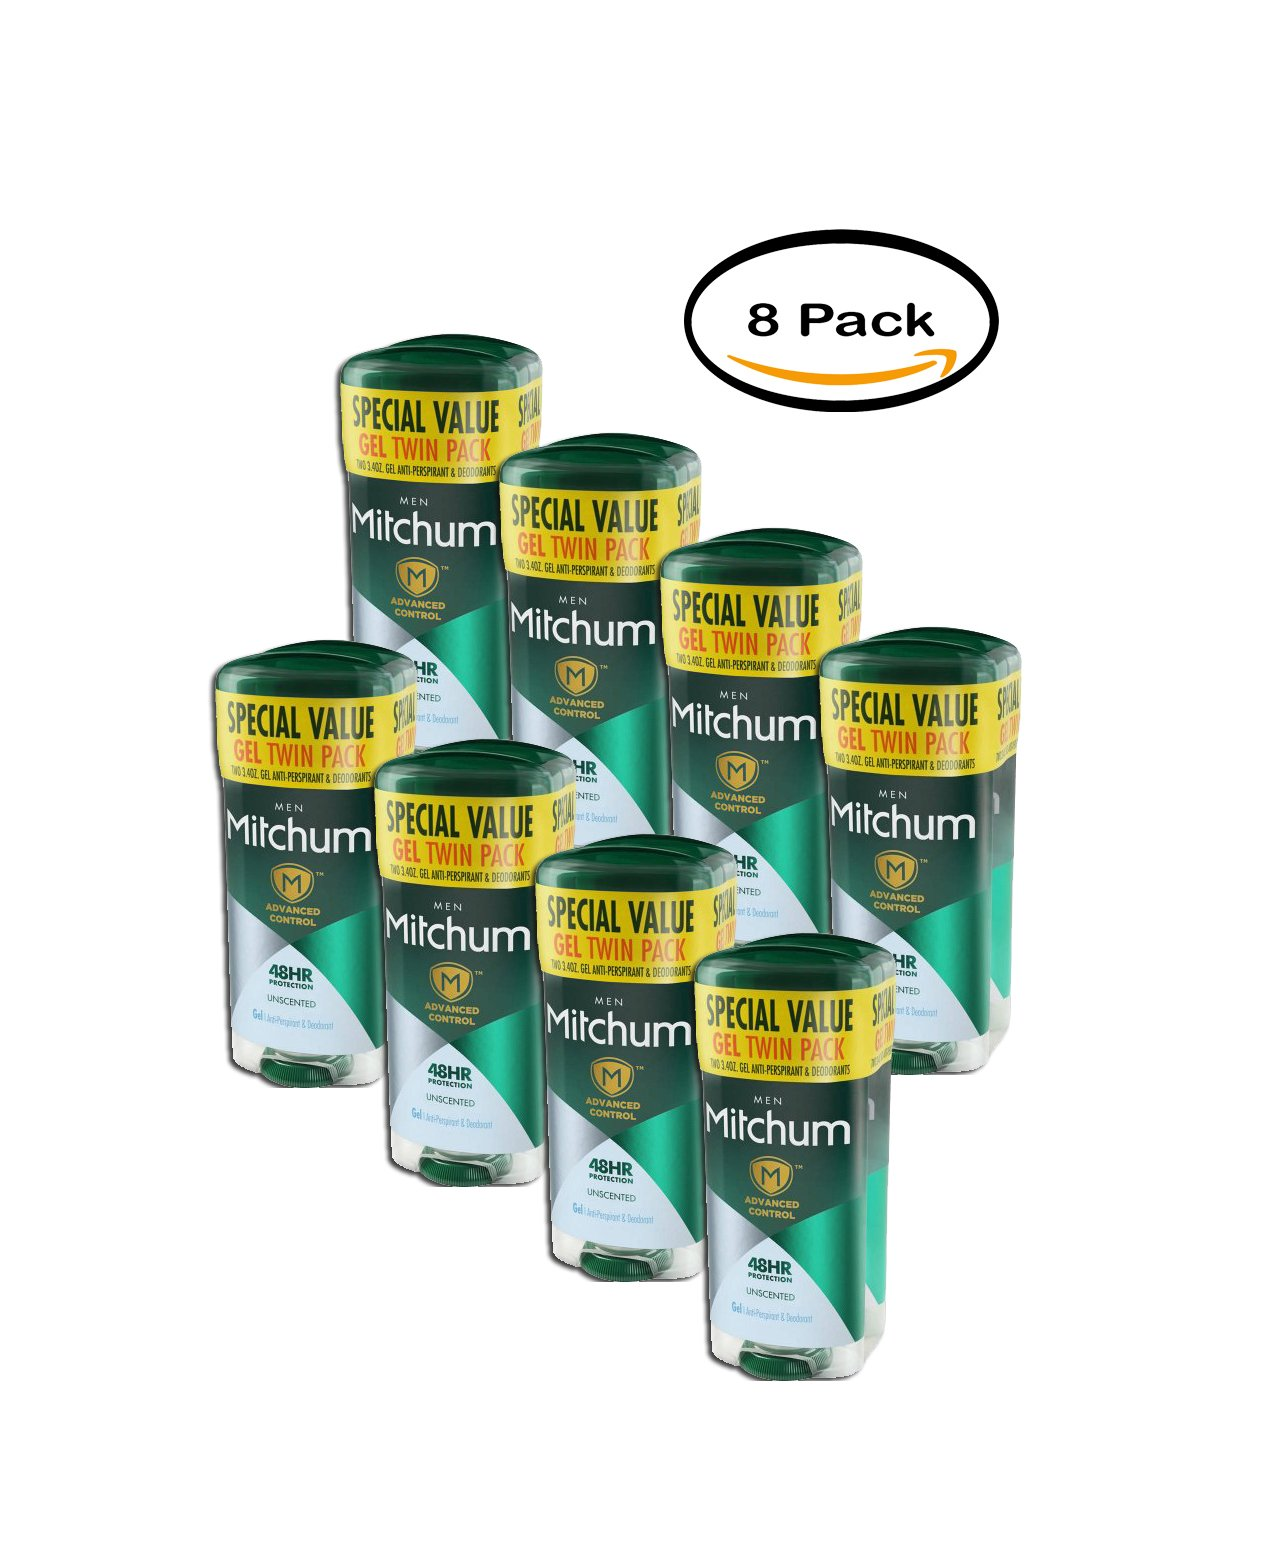 PACK OF 8 - Mitchum Men Advanced Unscented Gel AntiPerspirant&Deodorant3.4oz 2CT